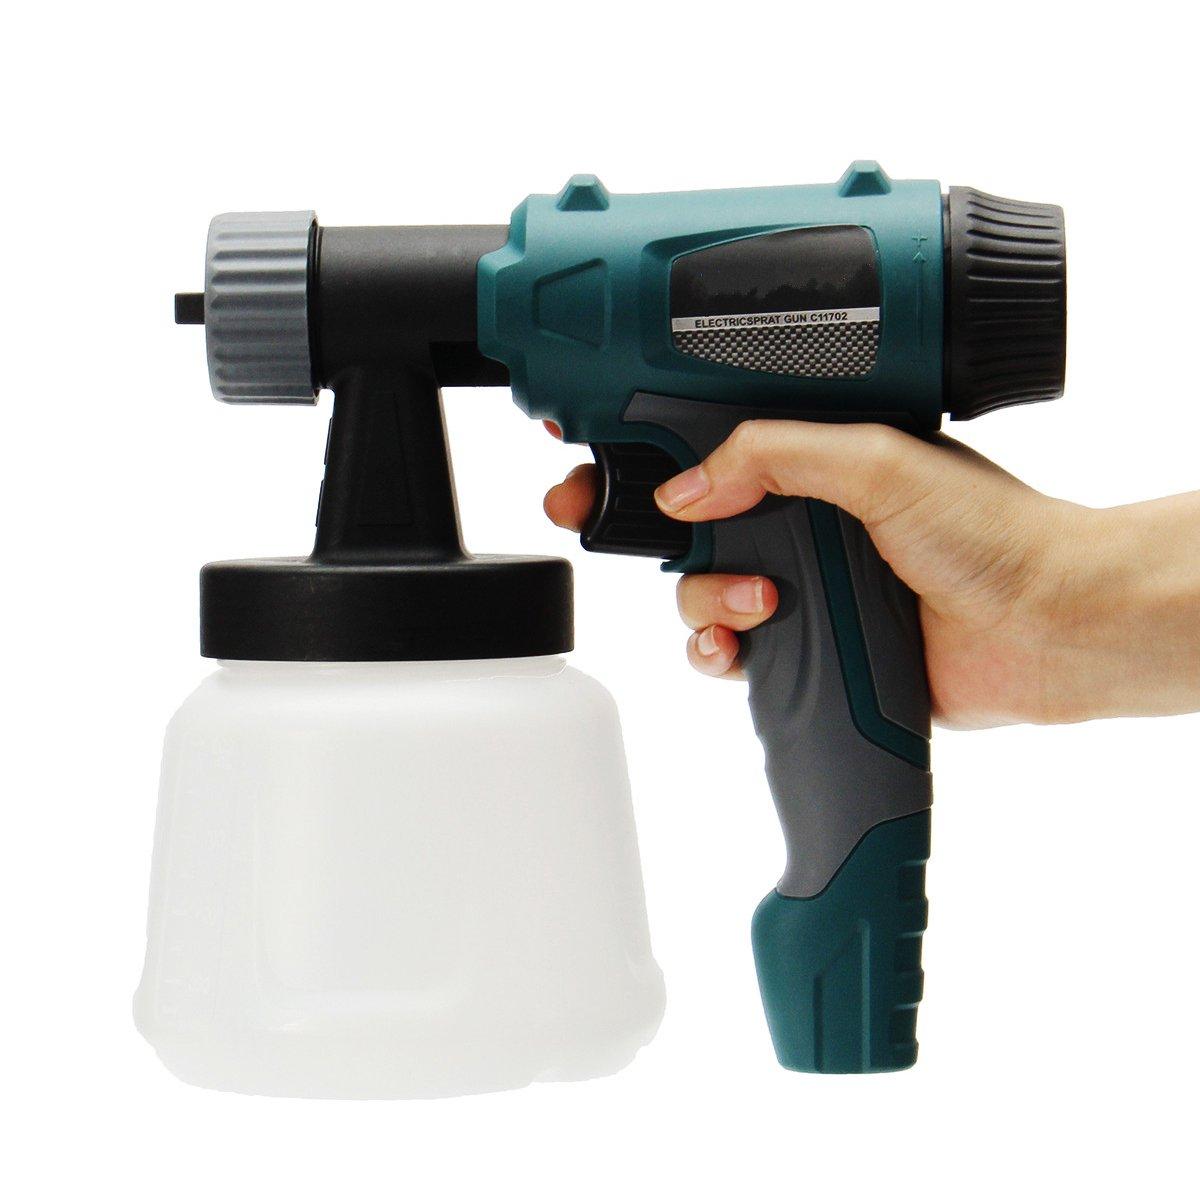 800W 900ML Electric Painter Gun Spray Latex Paint Sprayer House Painting Machine by Ologymart (Image #1)